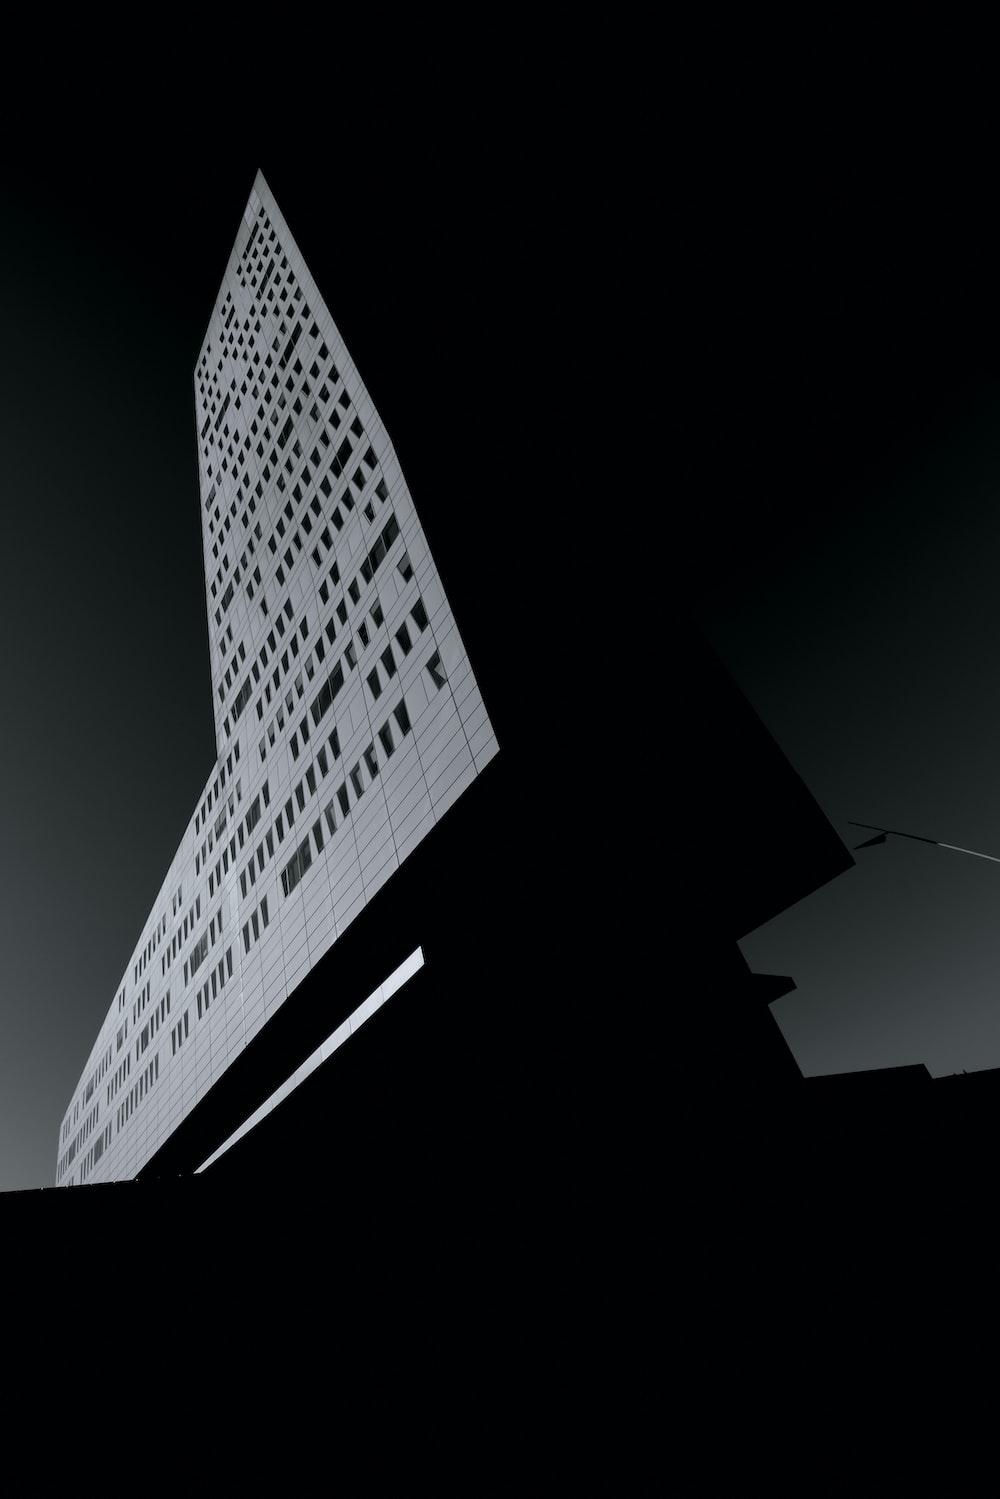 white and black building illustration